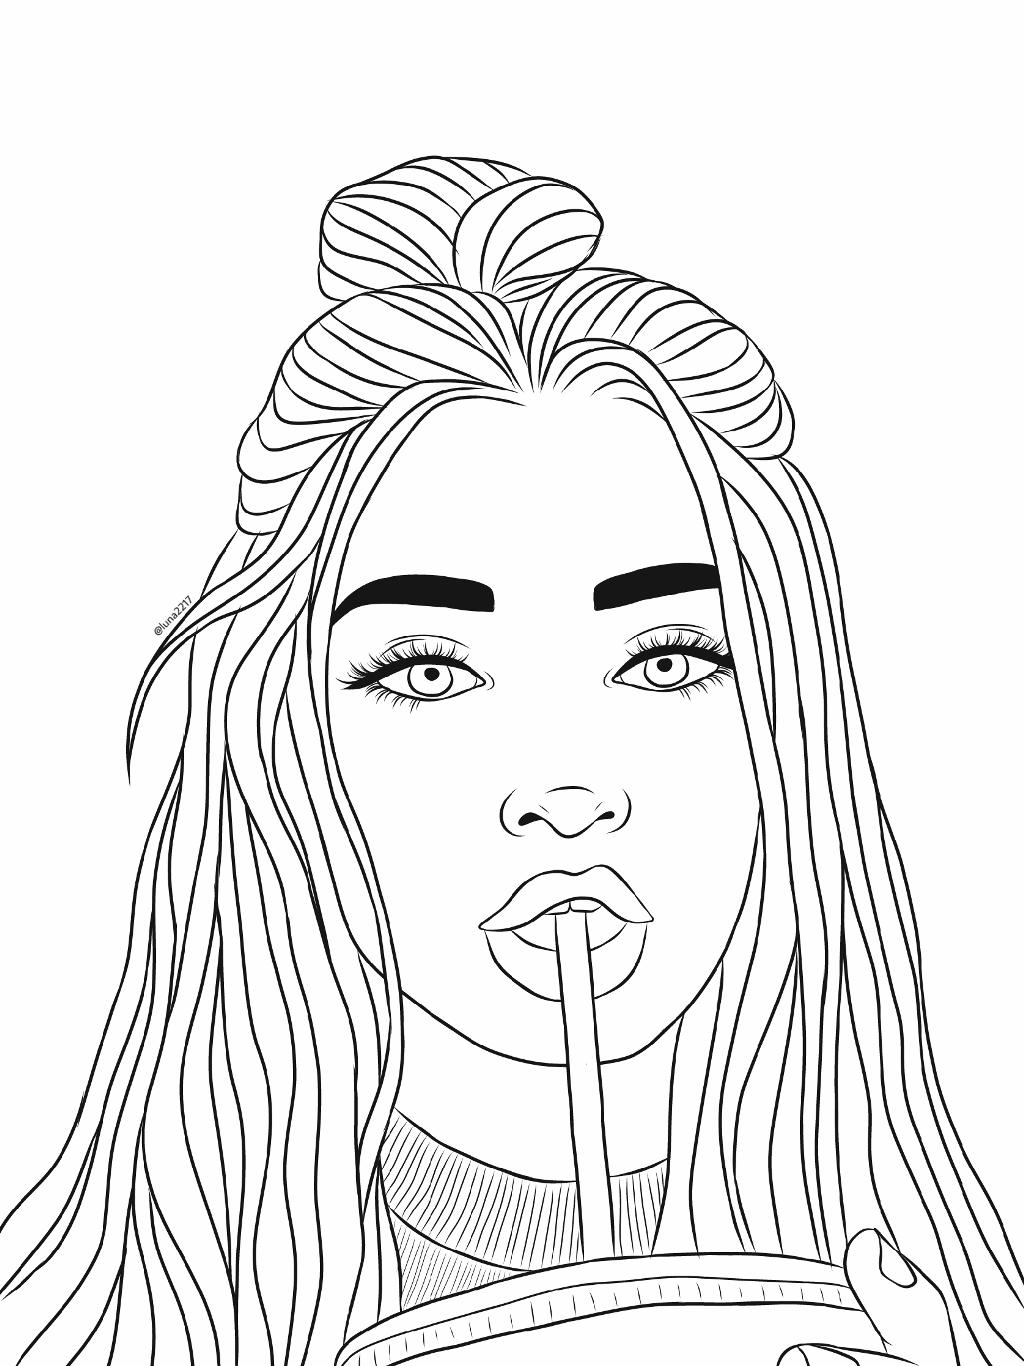 #girl-drawing on Tumblr